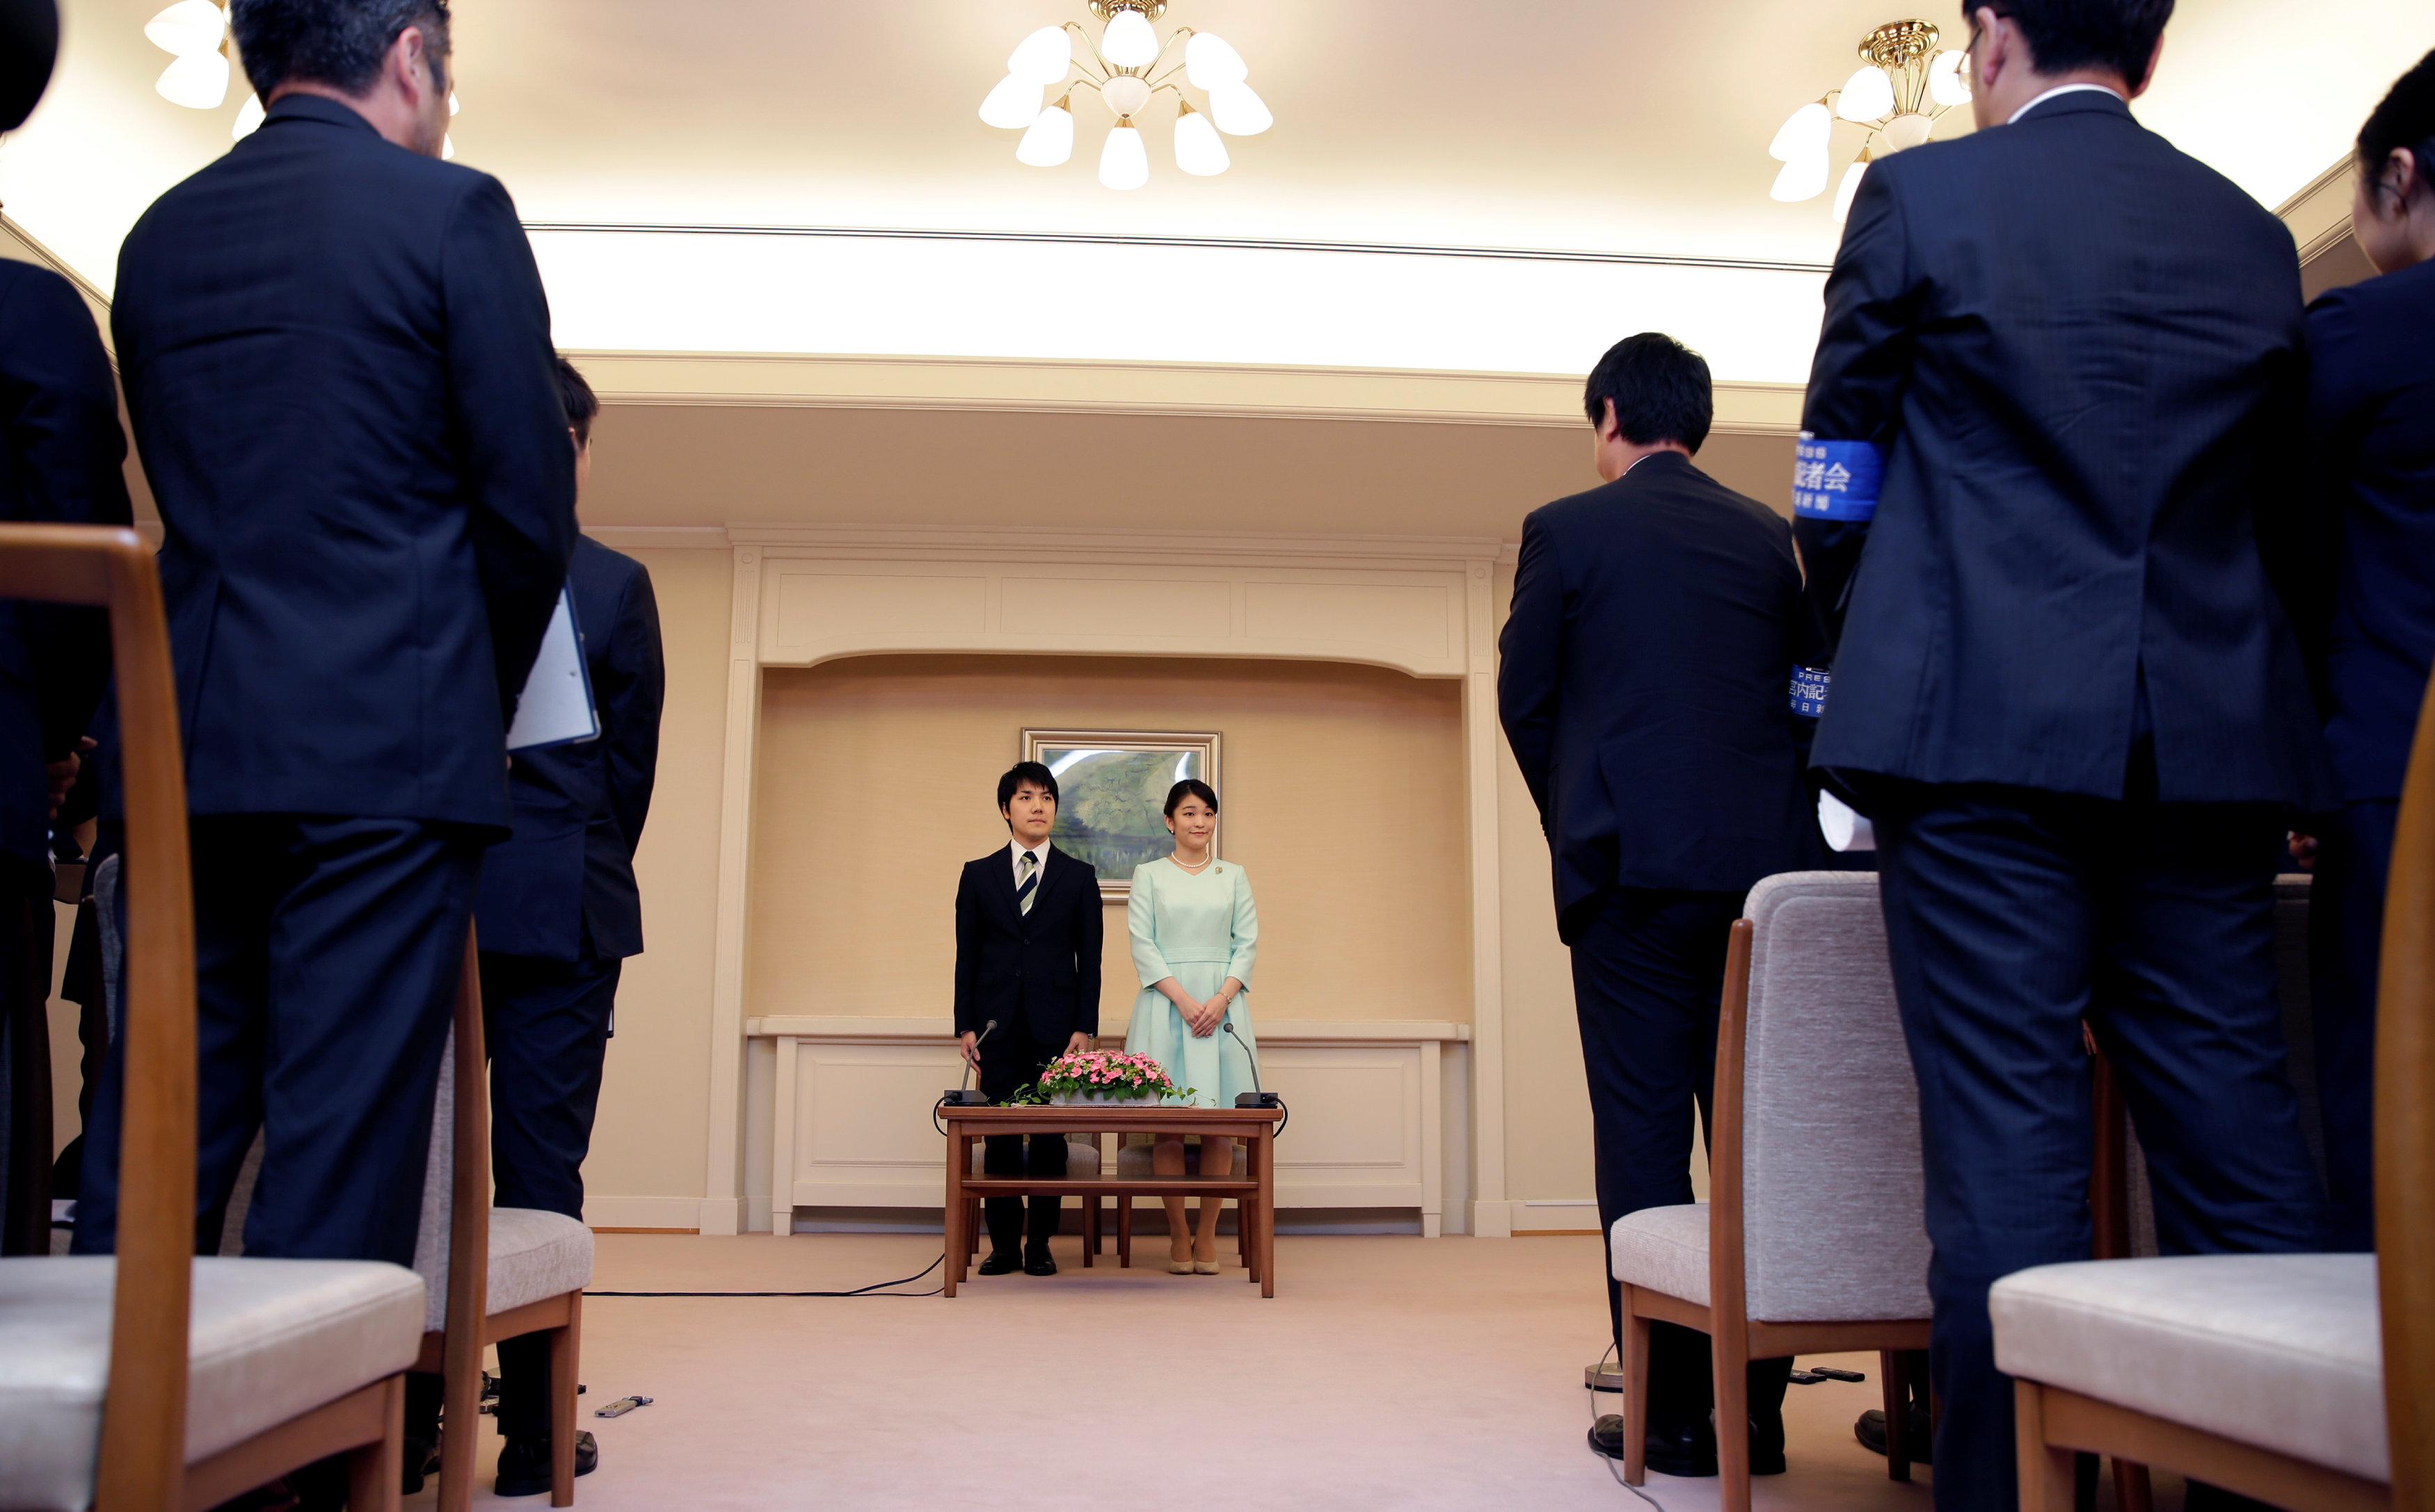 Princess Mako, the elder daughter of Prince Akishino and Princess Kiko, and her fiancee Kei Komuro, a university friend of Princess Mako, stand during a press conference to announce their engagement at Akasaka East Residence in Tokyo, Japan on September 3, 2017. (REUTERS/Shizuo Kambayashi/Pool)